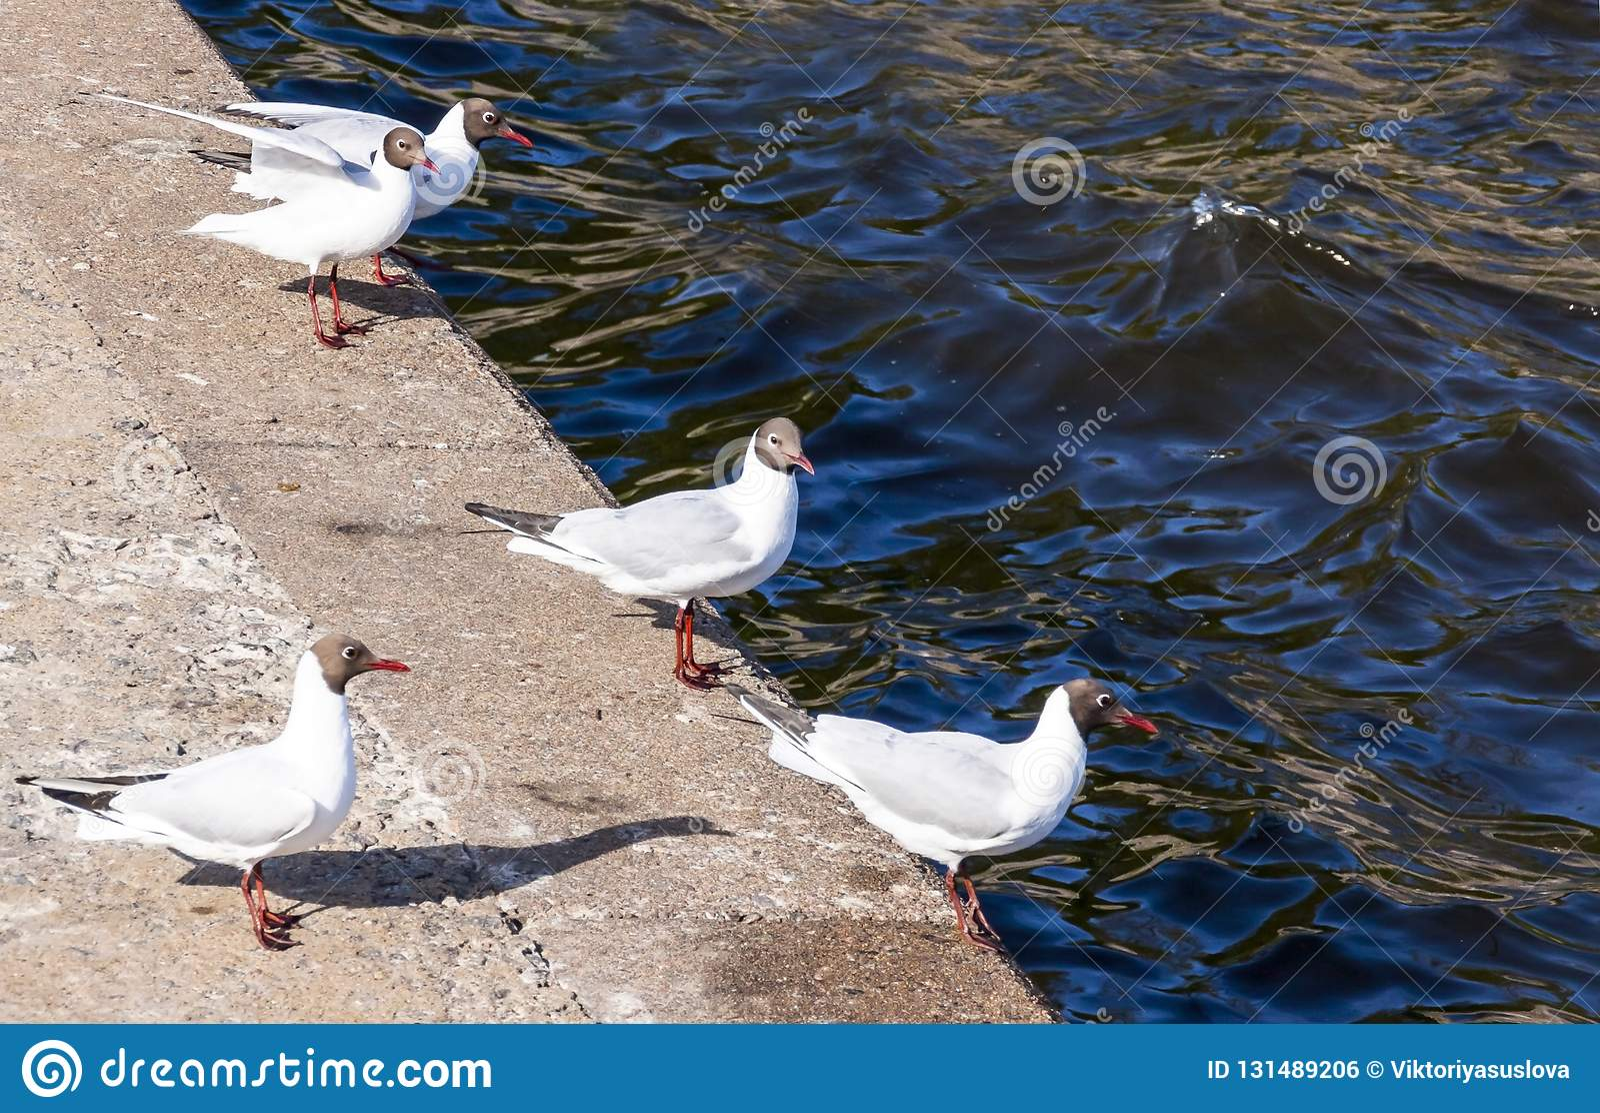 Seagulls on parapet near the Gulf of Finland in Kronstadt